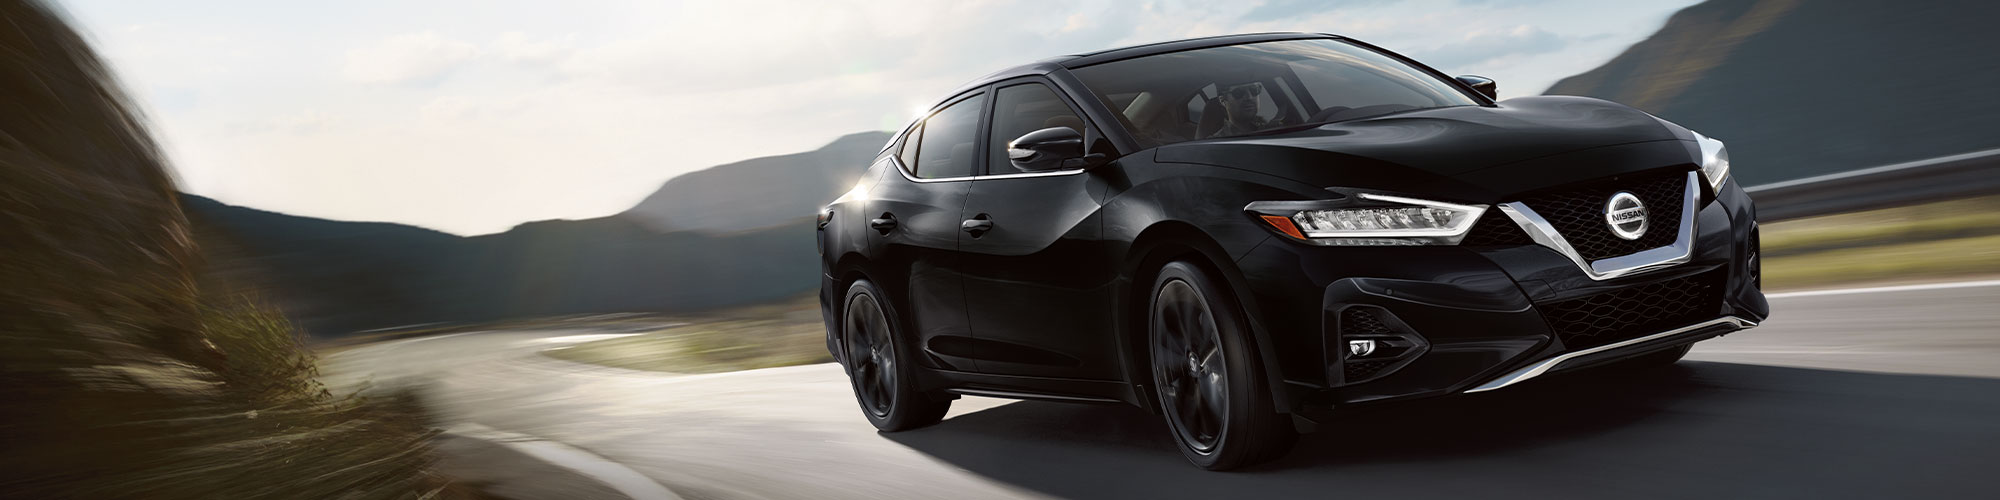 2019 Nissan Maxima horsepower